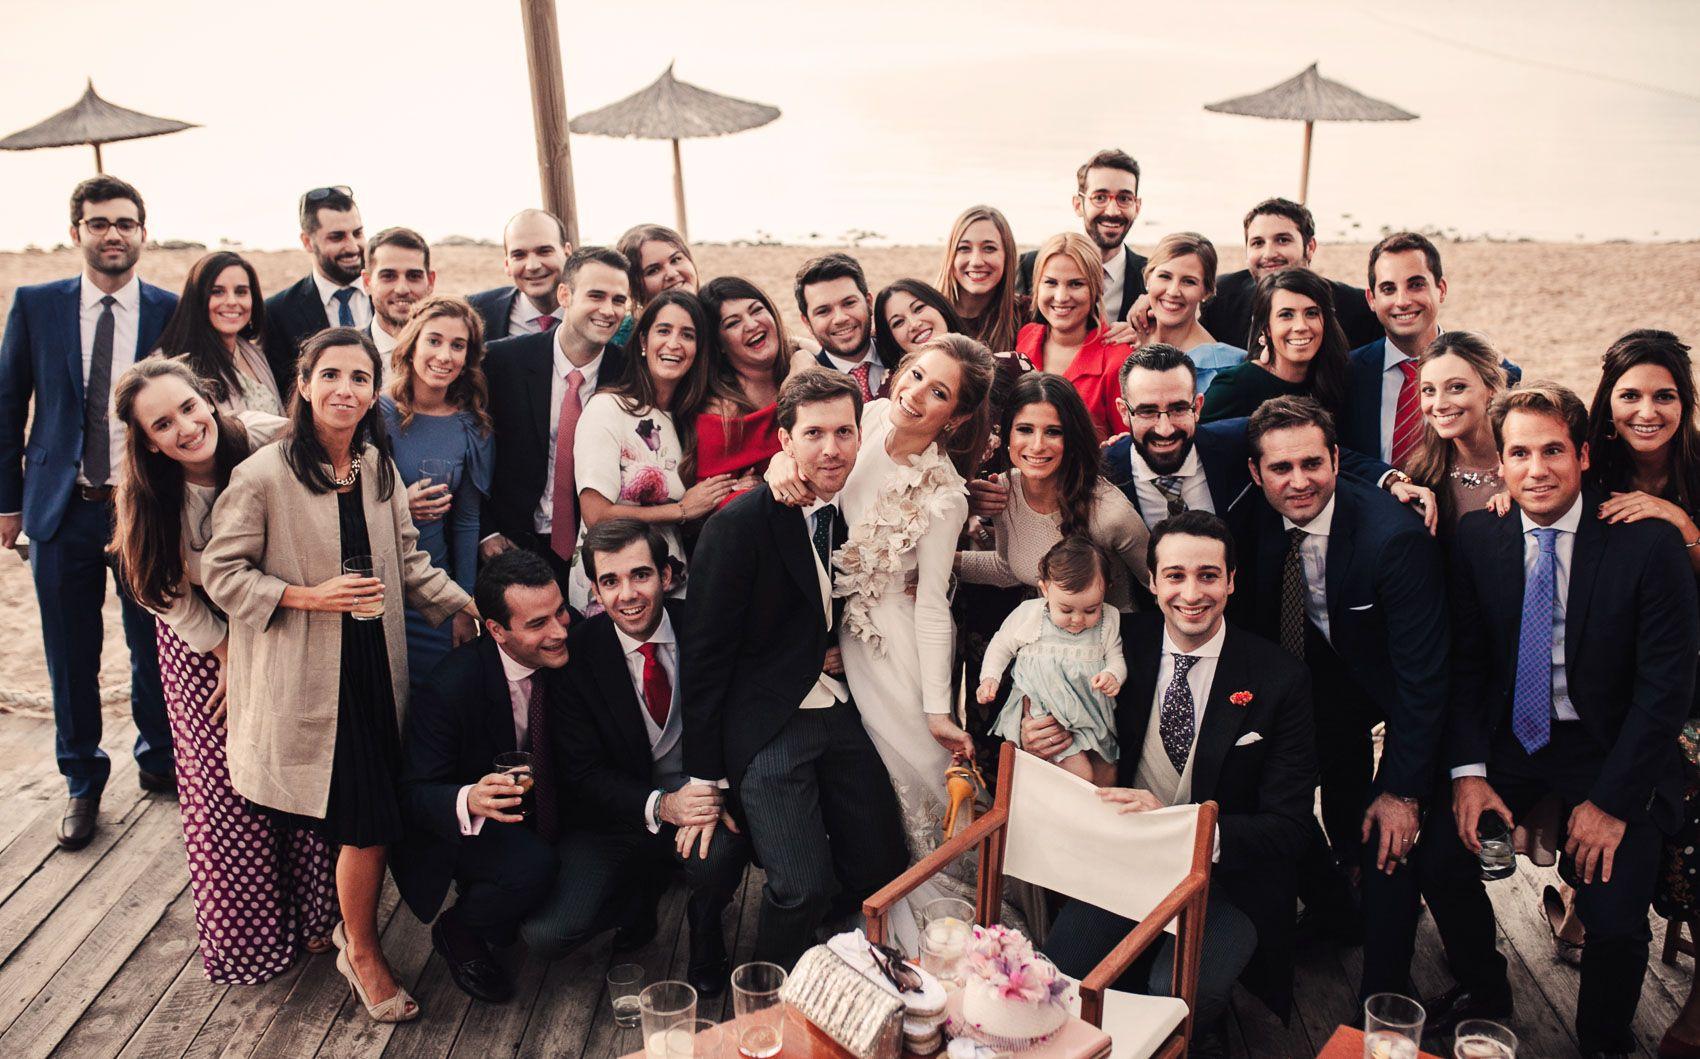 fotografia grupo boda